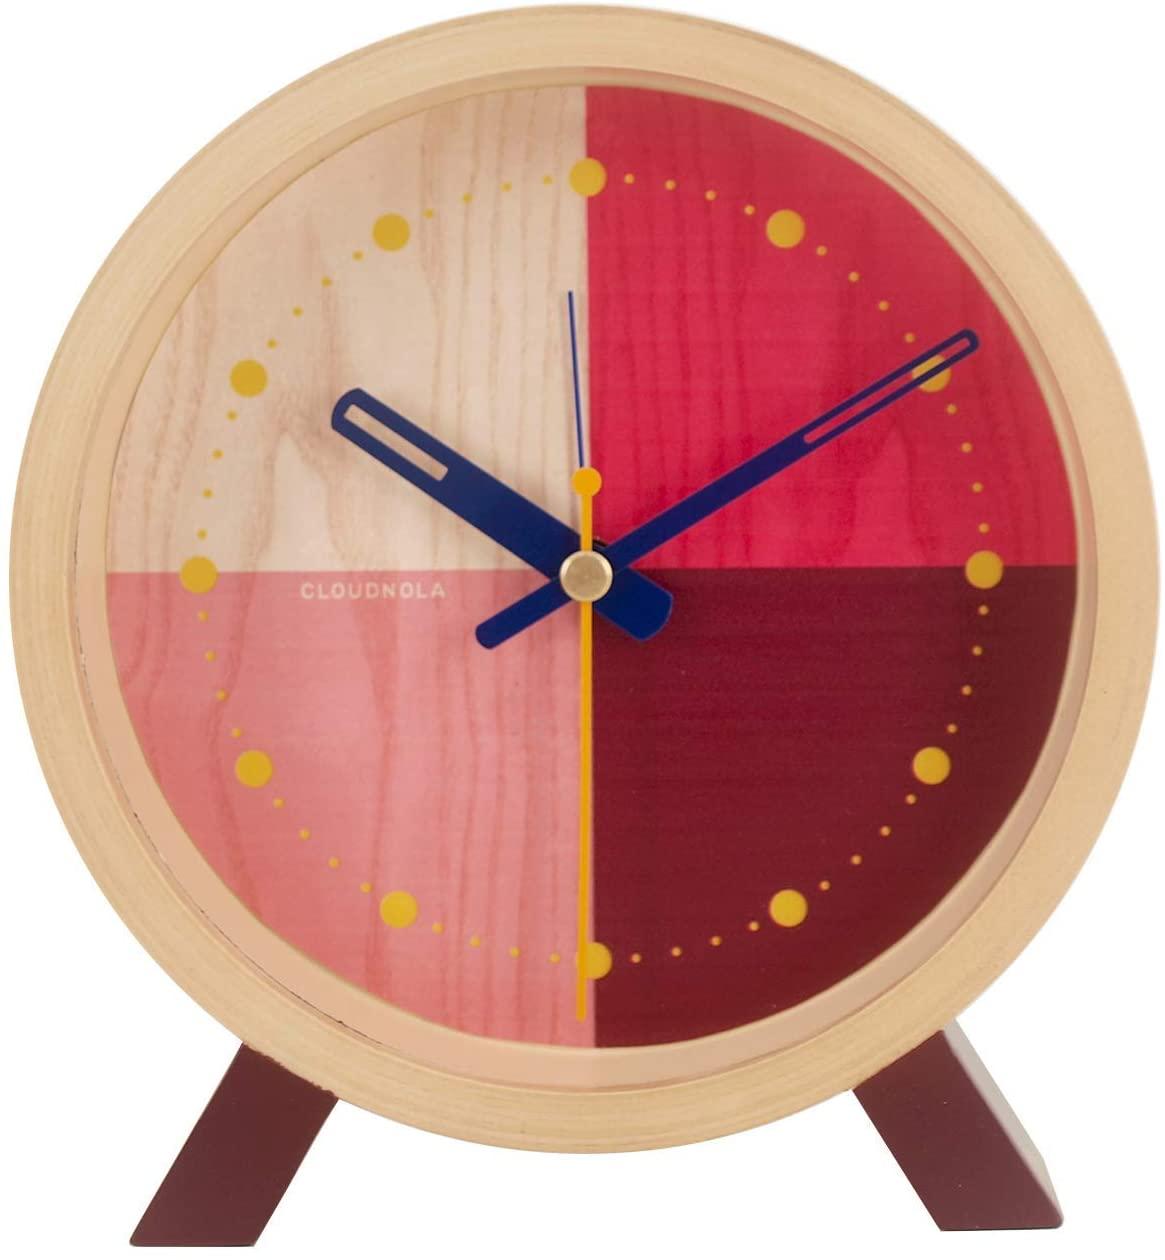 Cloudnola Flor Wood Desk and Alarm Clock